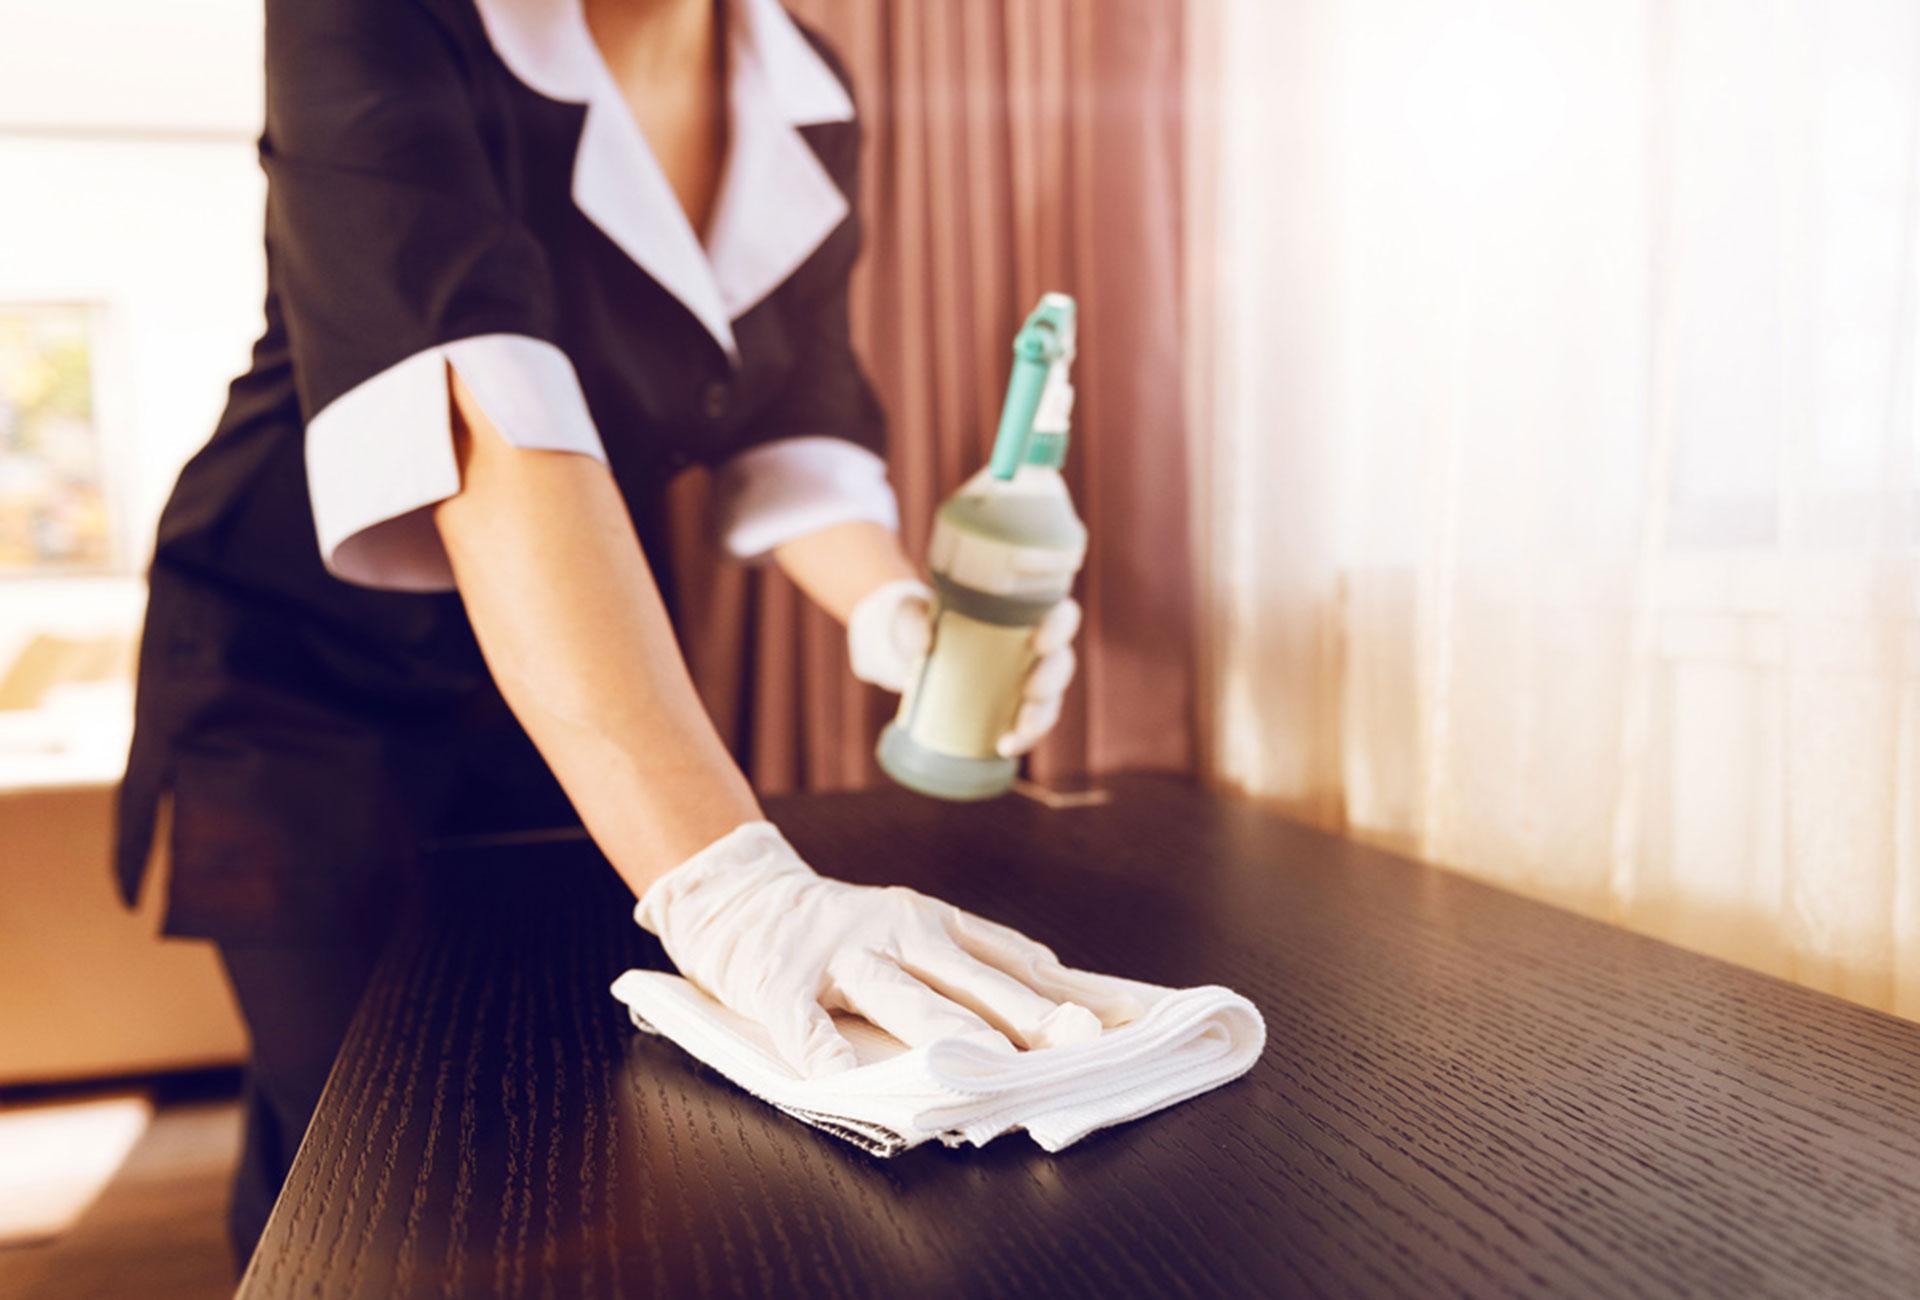 Profilaktika i prevencia sreshtu COVID-19 v hotel Spa Club Bor Velingrad